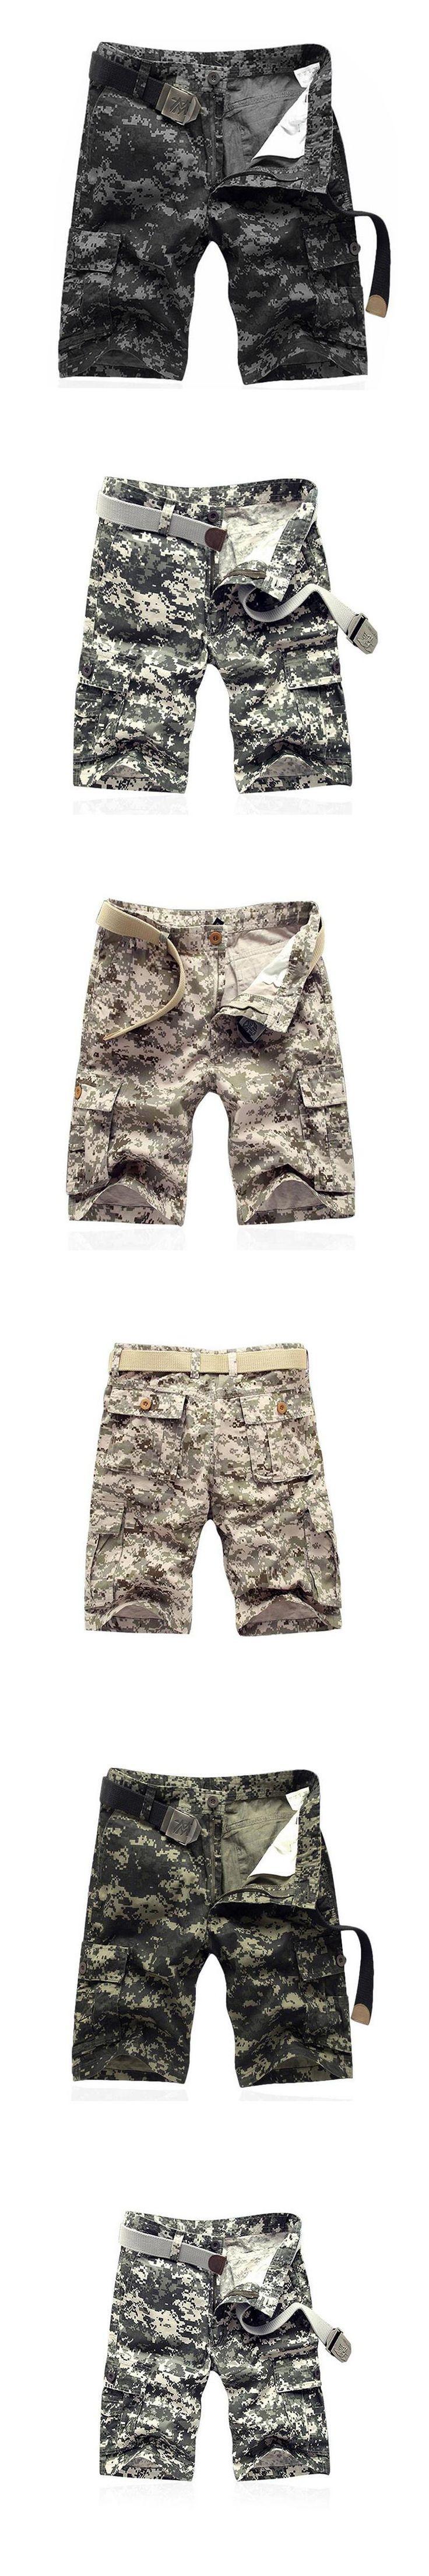 2017 Men Hot Sale Cargo Shorts Multi Pocket Casual Camouflage Summer Brand Clothing Male Fashion Army Work Shorts Plus Size 42